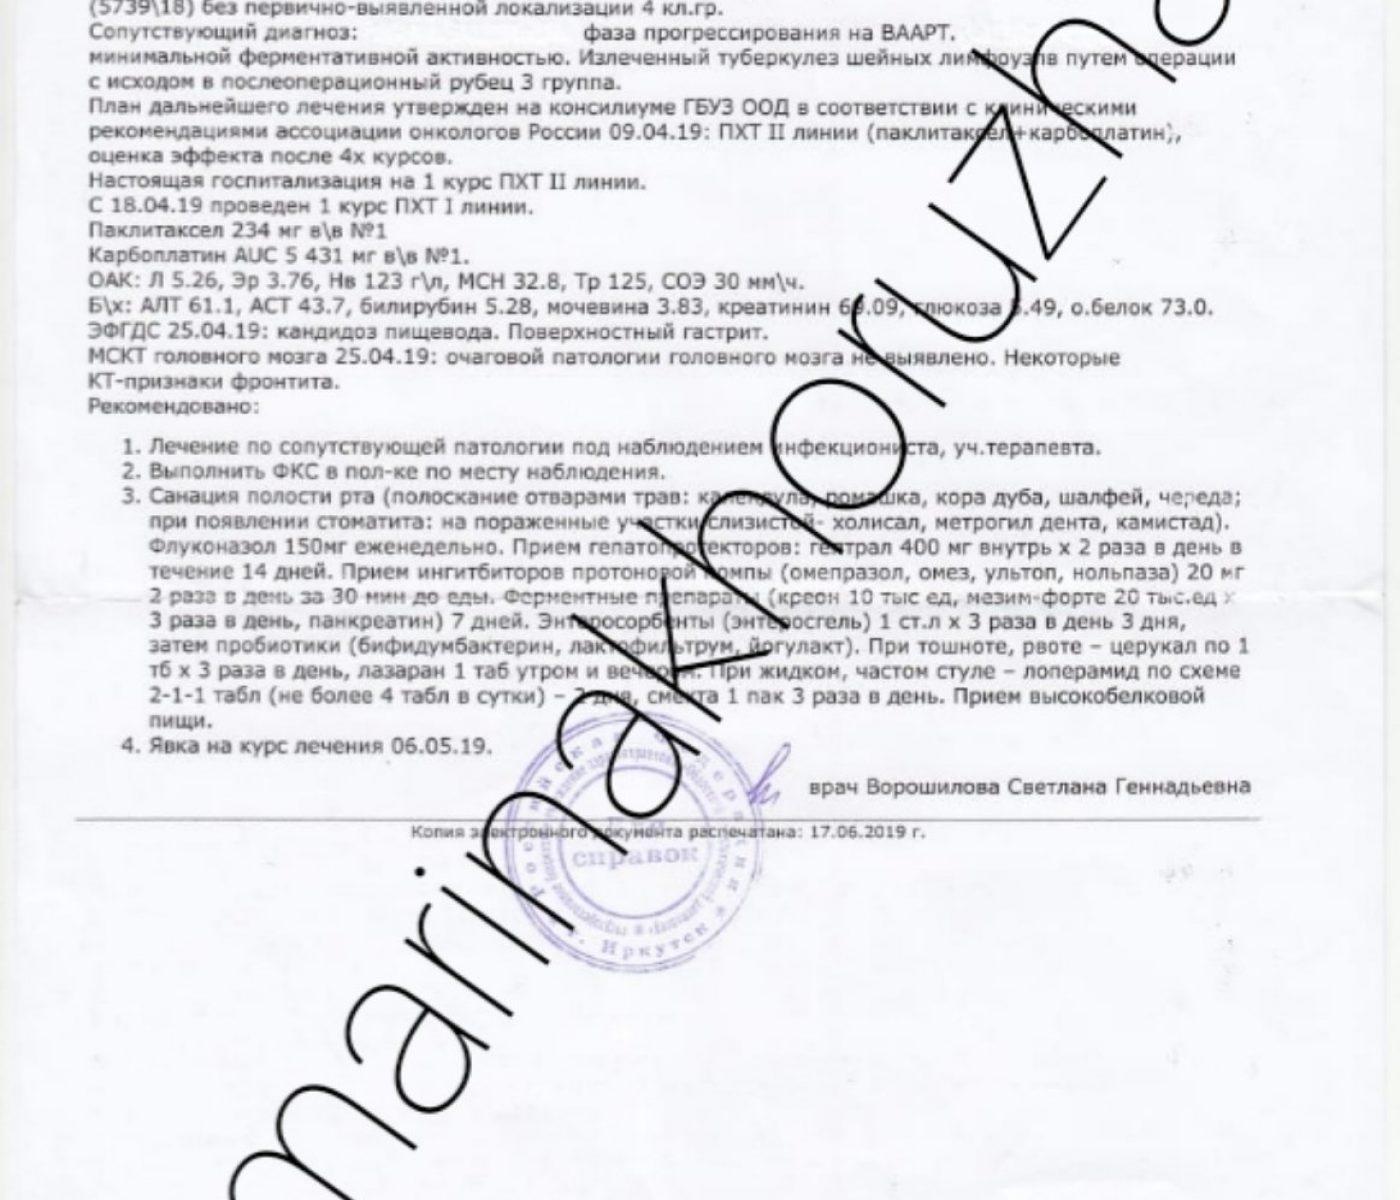 IMG-45436402f7bbf10db6c8c552298fef85-V